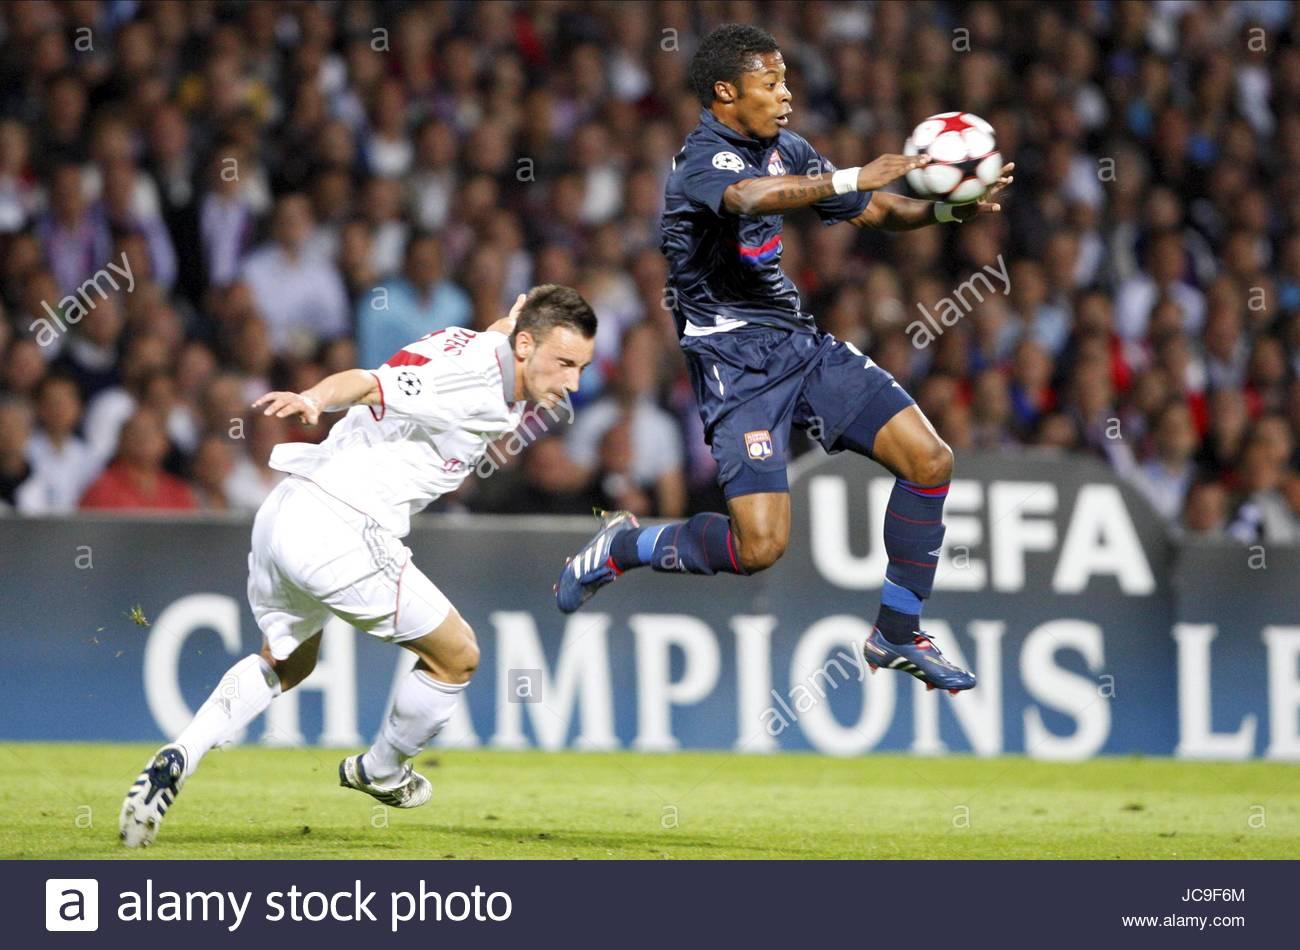 MICHEL BASTOS E DIEGO CONTENUTO Olympique Lyonnais V BAYERN MU LYON FRANCIA 27 Aprile 2010 Immagini Stock